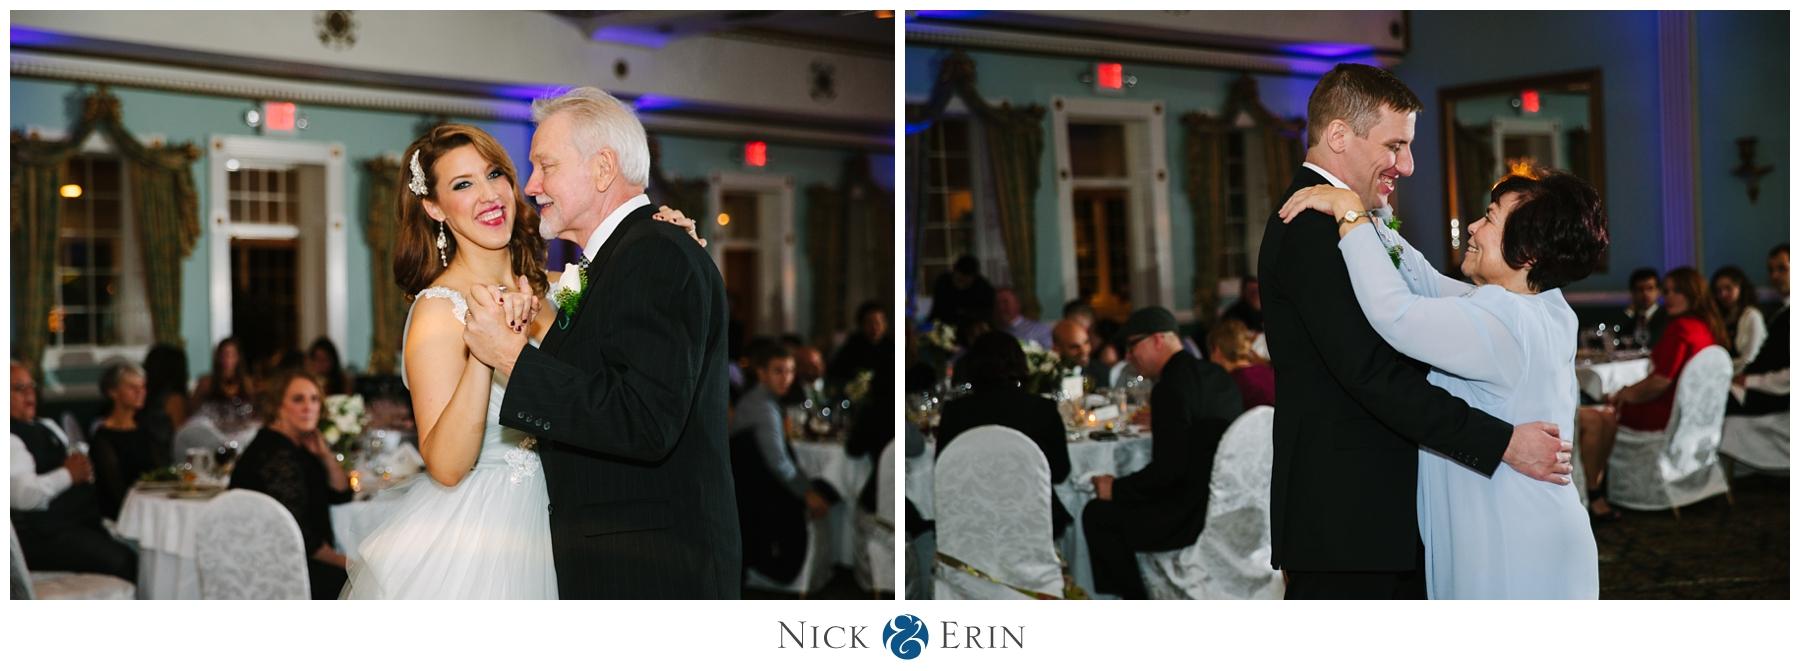 Donner_Photography_Mendenhall Inn Wedding_Blake & Kristina_0039